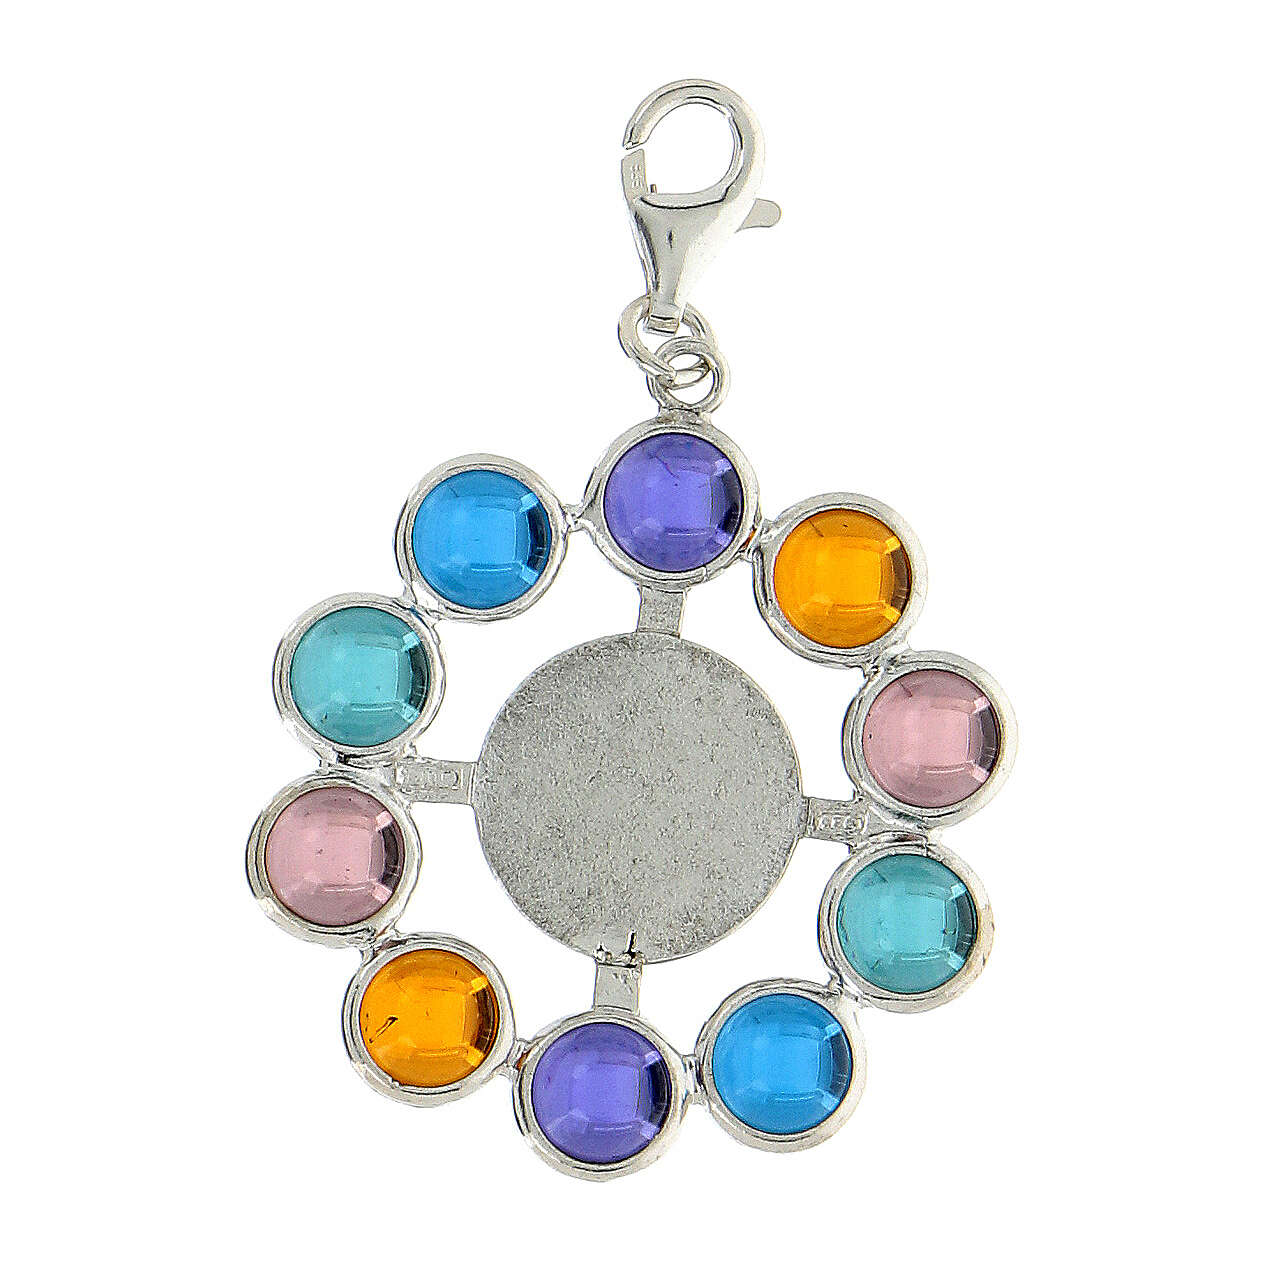 Pingente terço contas 6 mm pedra Siamite multicolorida prata 925 4